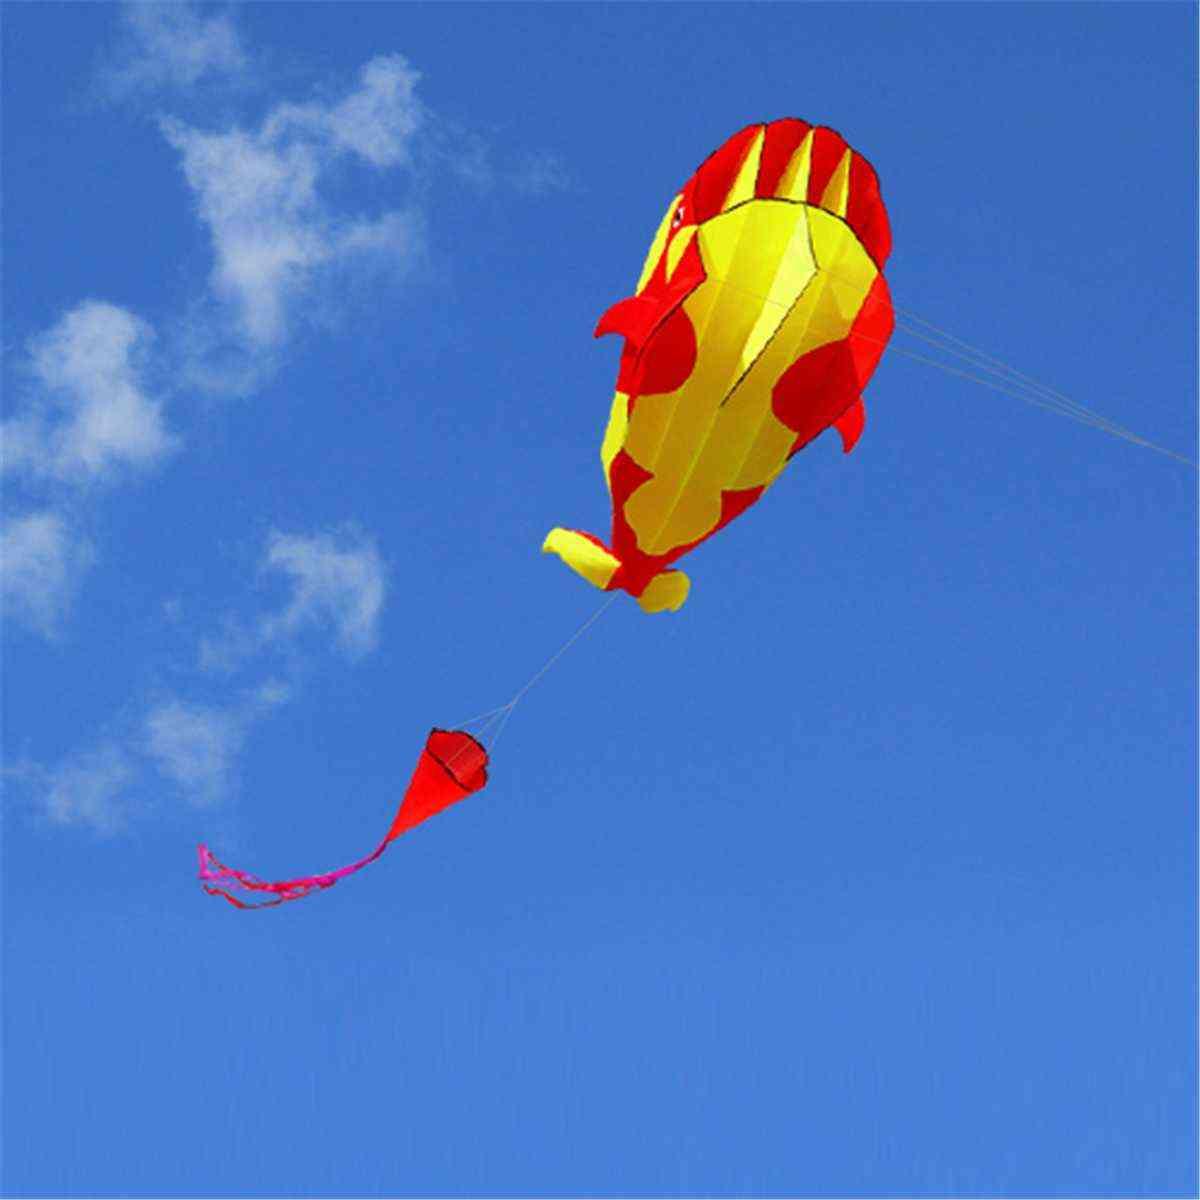 3d 215cm Dolphin Soft Kite Nylon Fabric Kite Line Animated Kites Fishing Inflatable Kite Toy